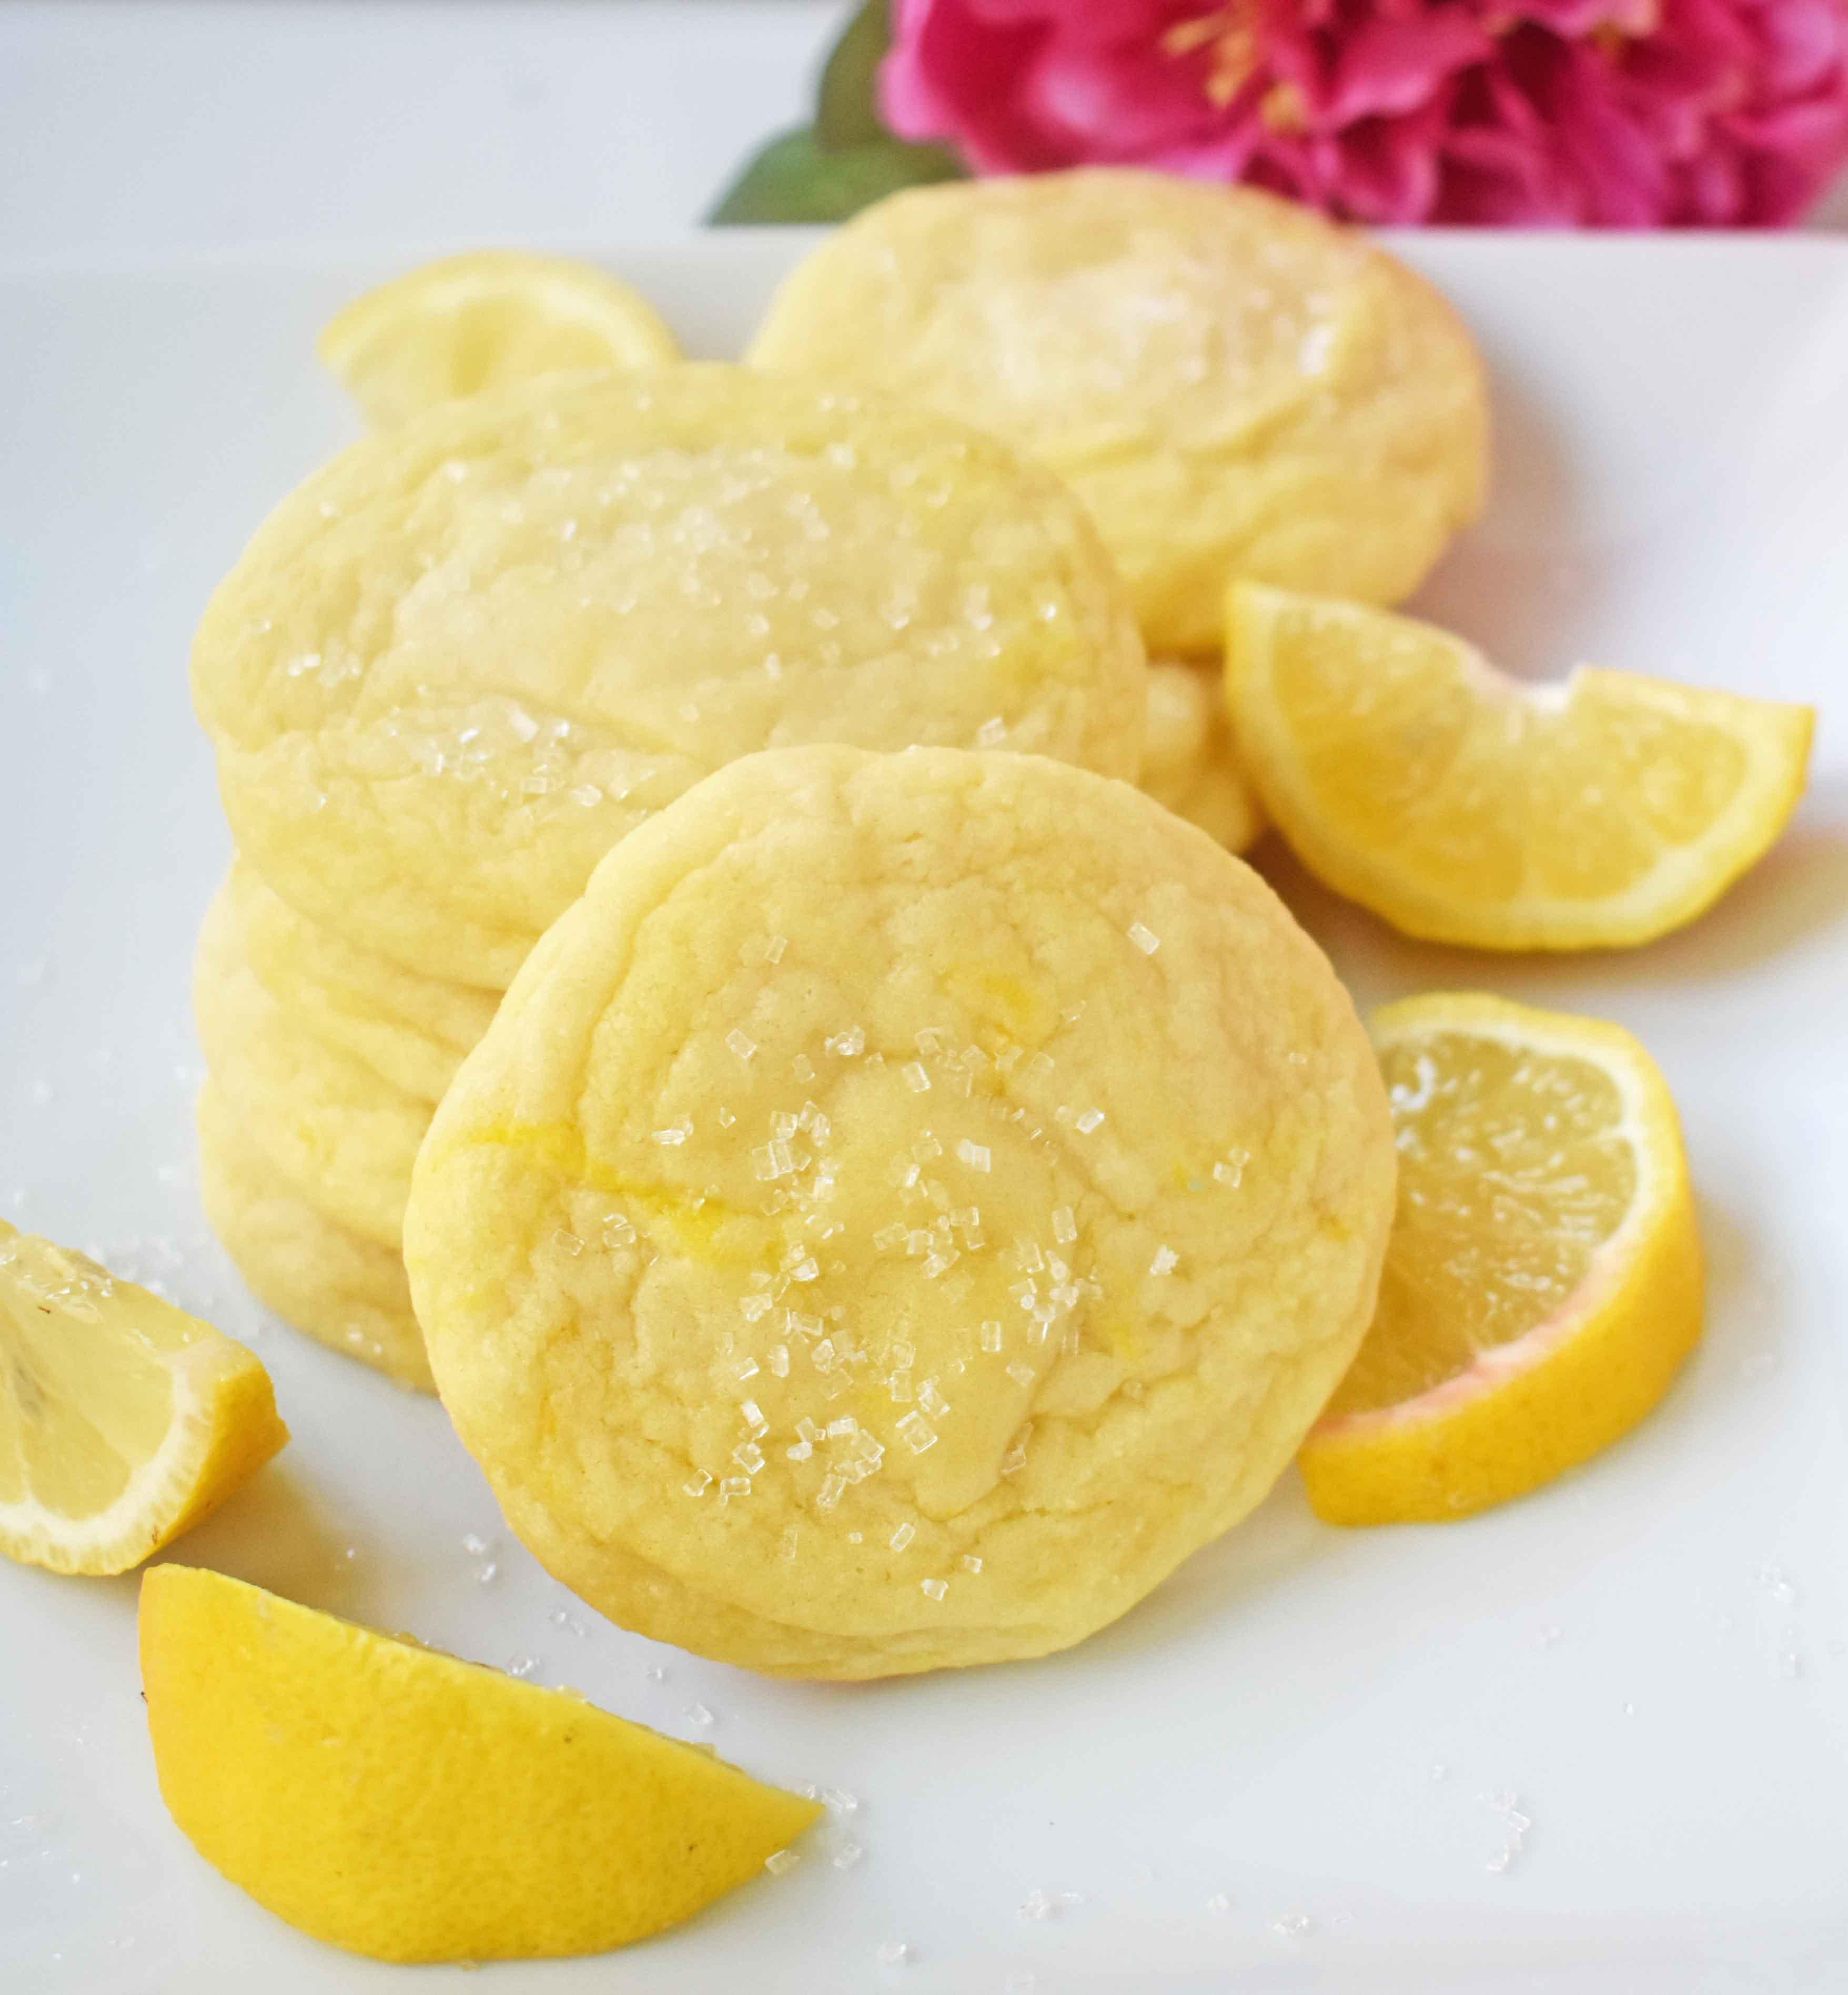 Lemon photo